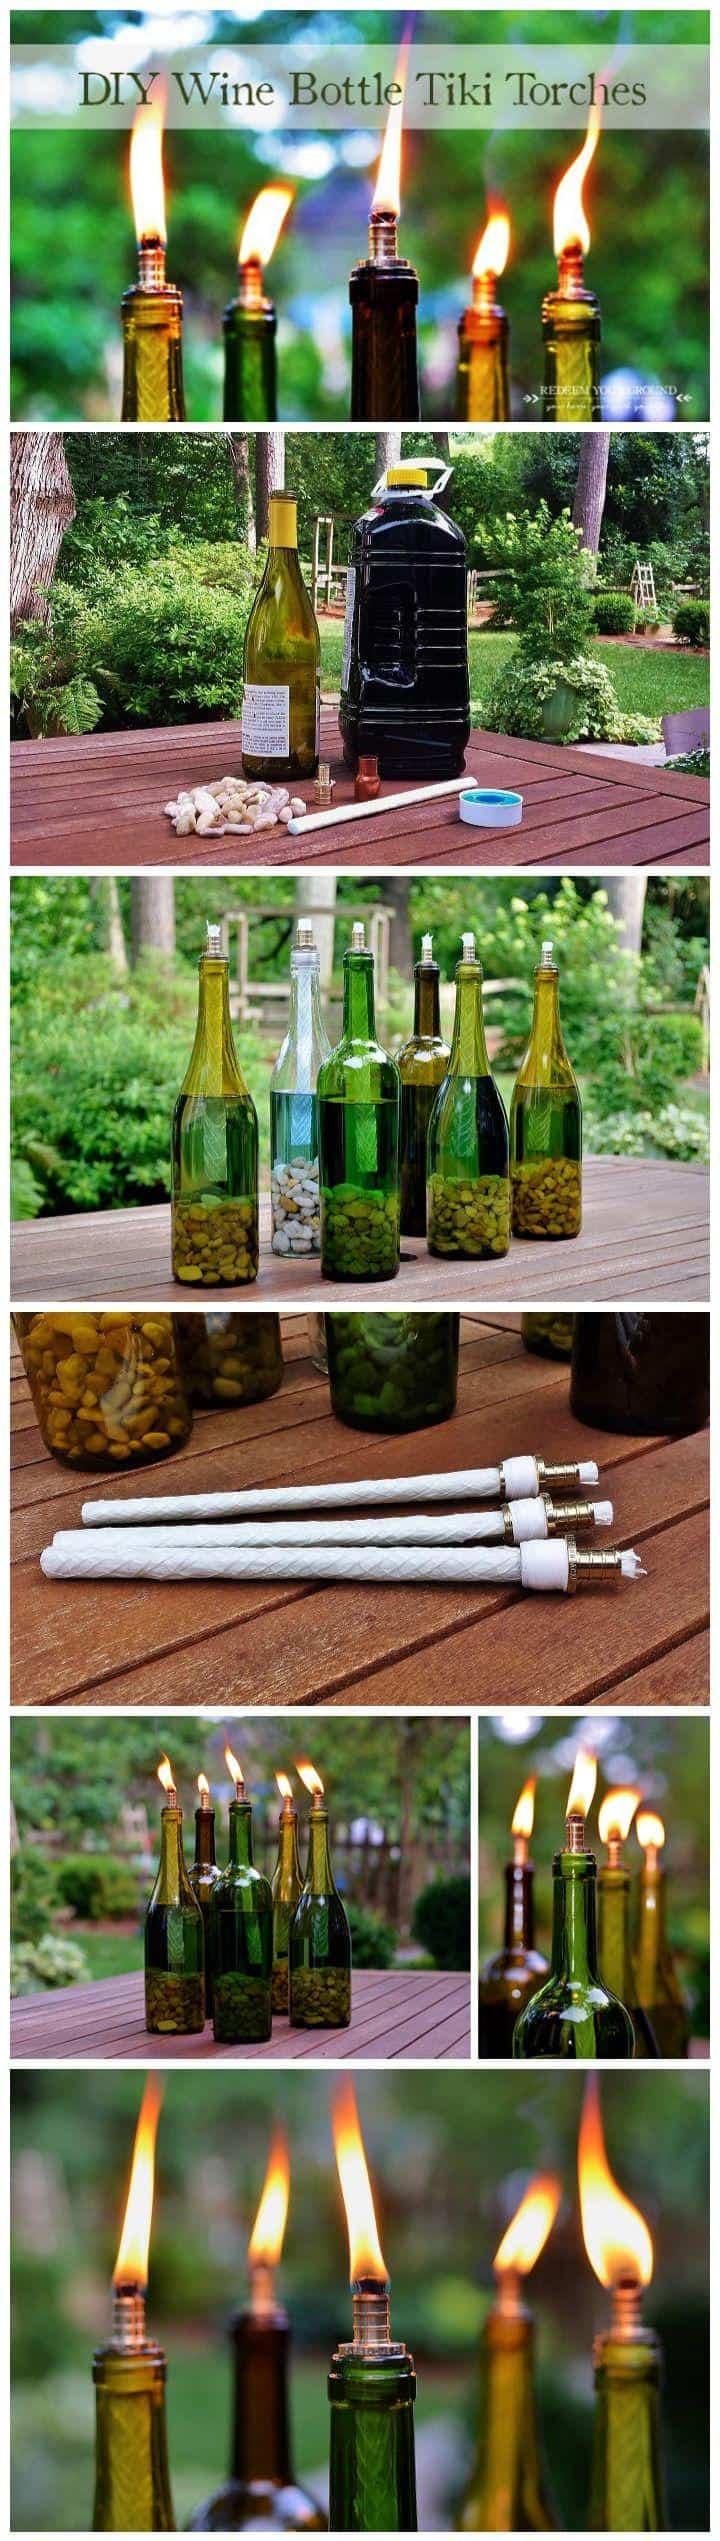 Wine bottles always look chic!